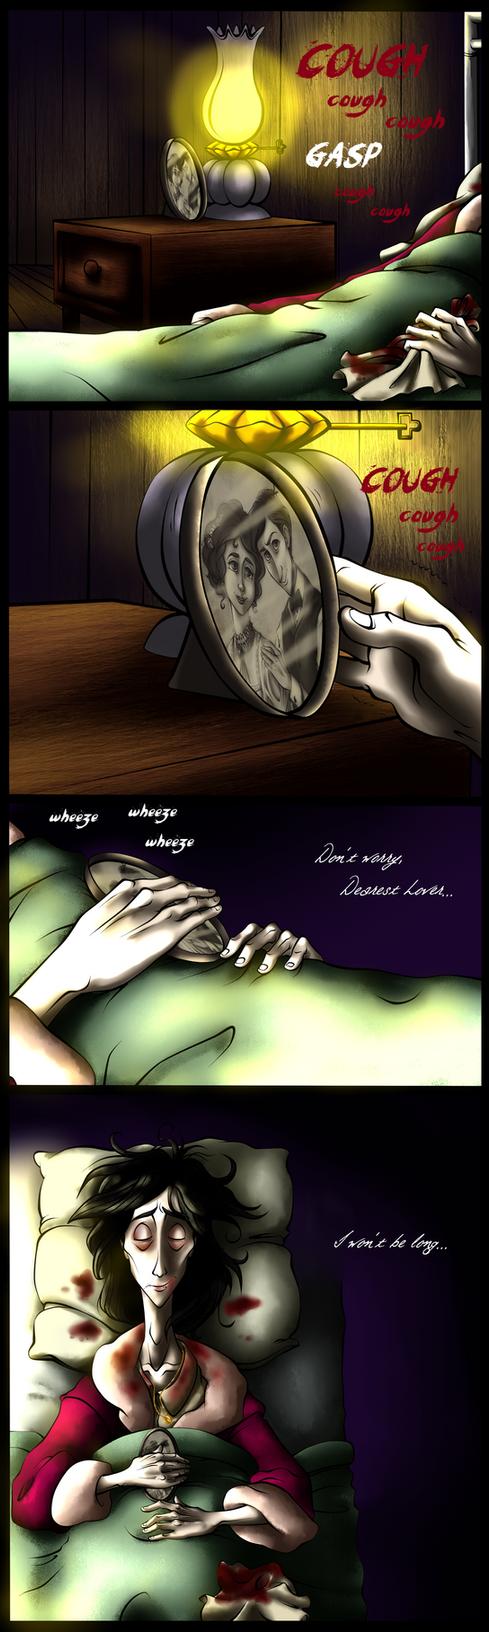 Soon My Dearest by Chrissyissypoo19